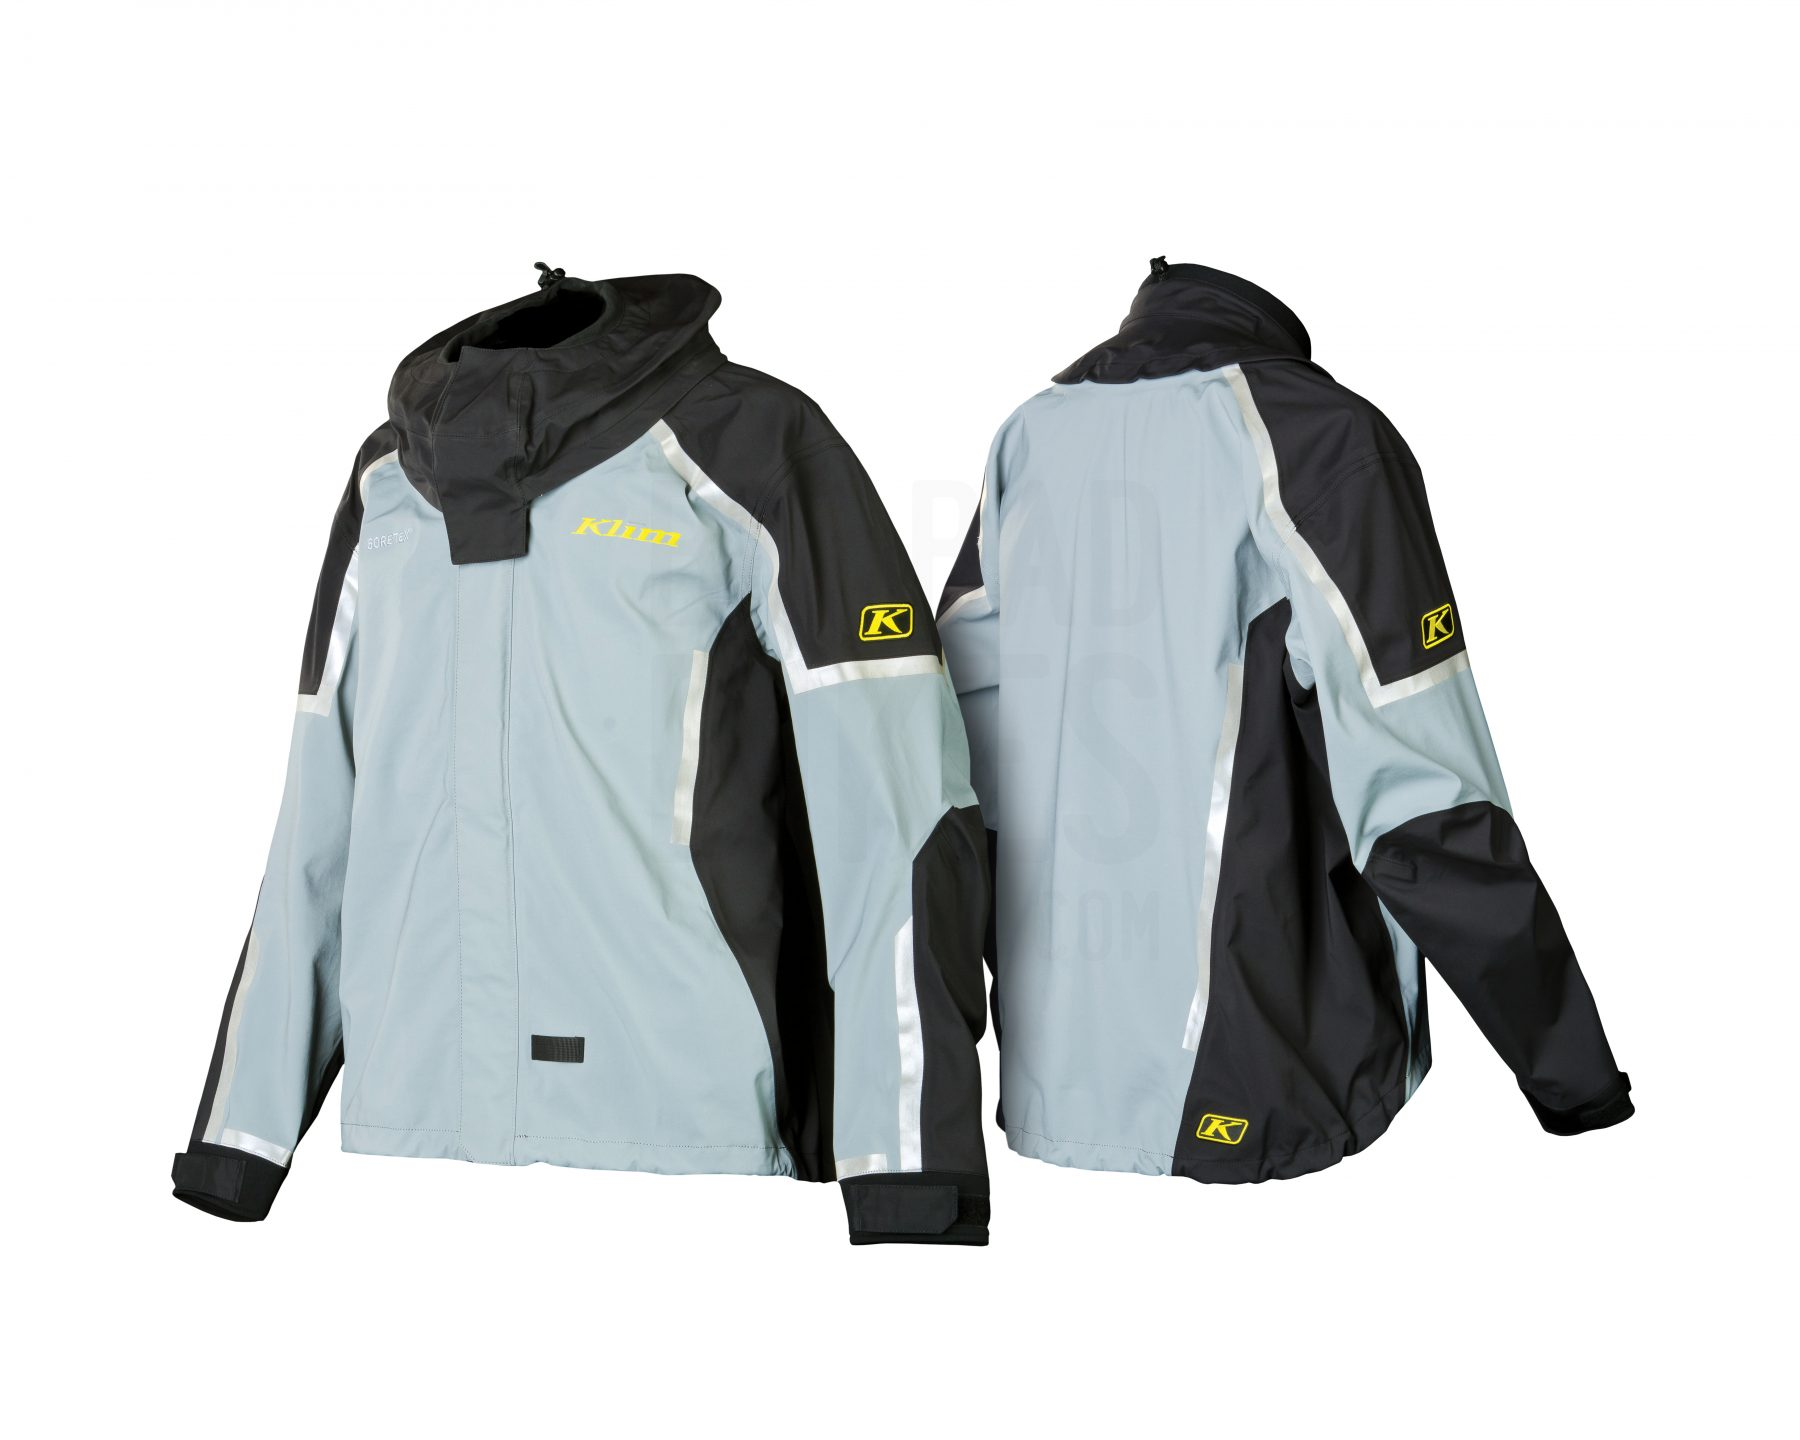 S Goretex Overshell Jacket 5057-000-000-D1